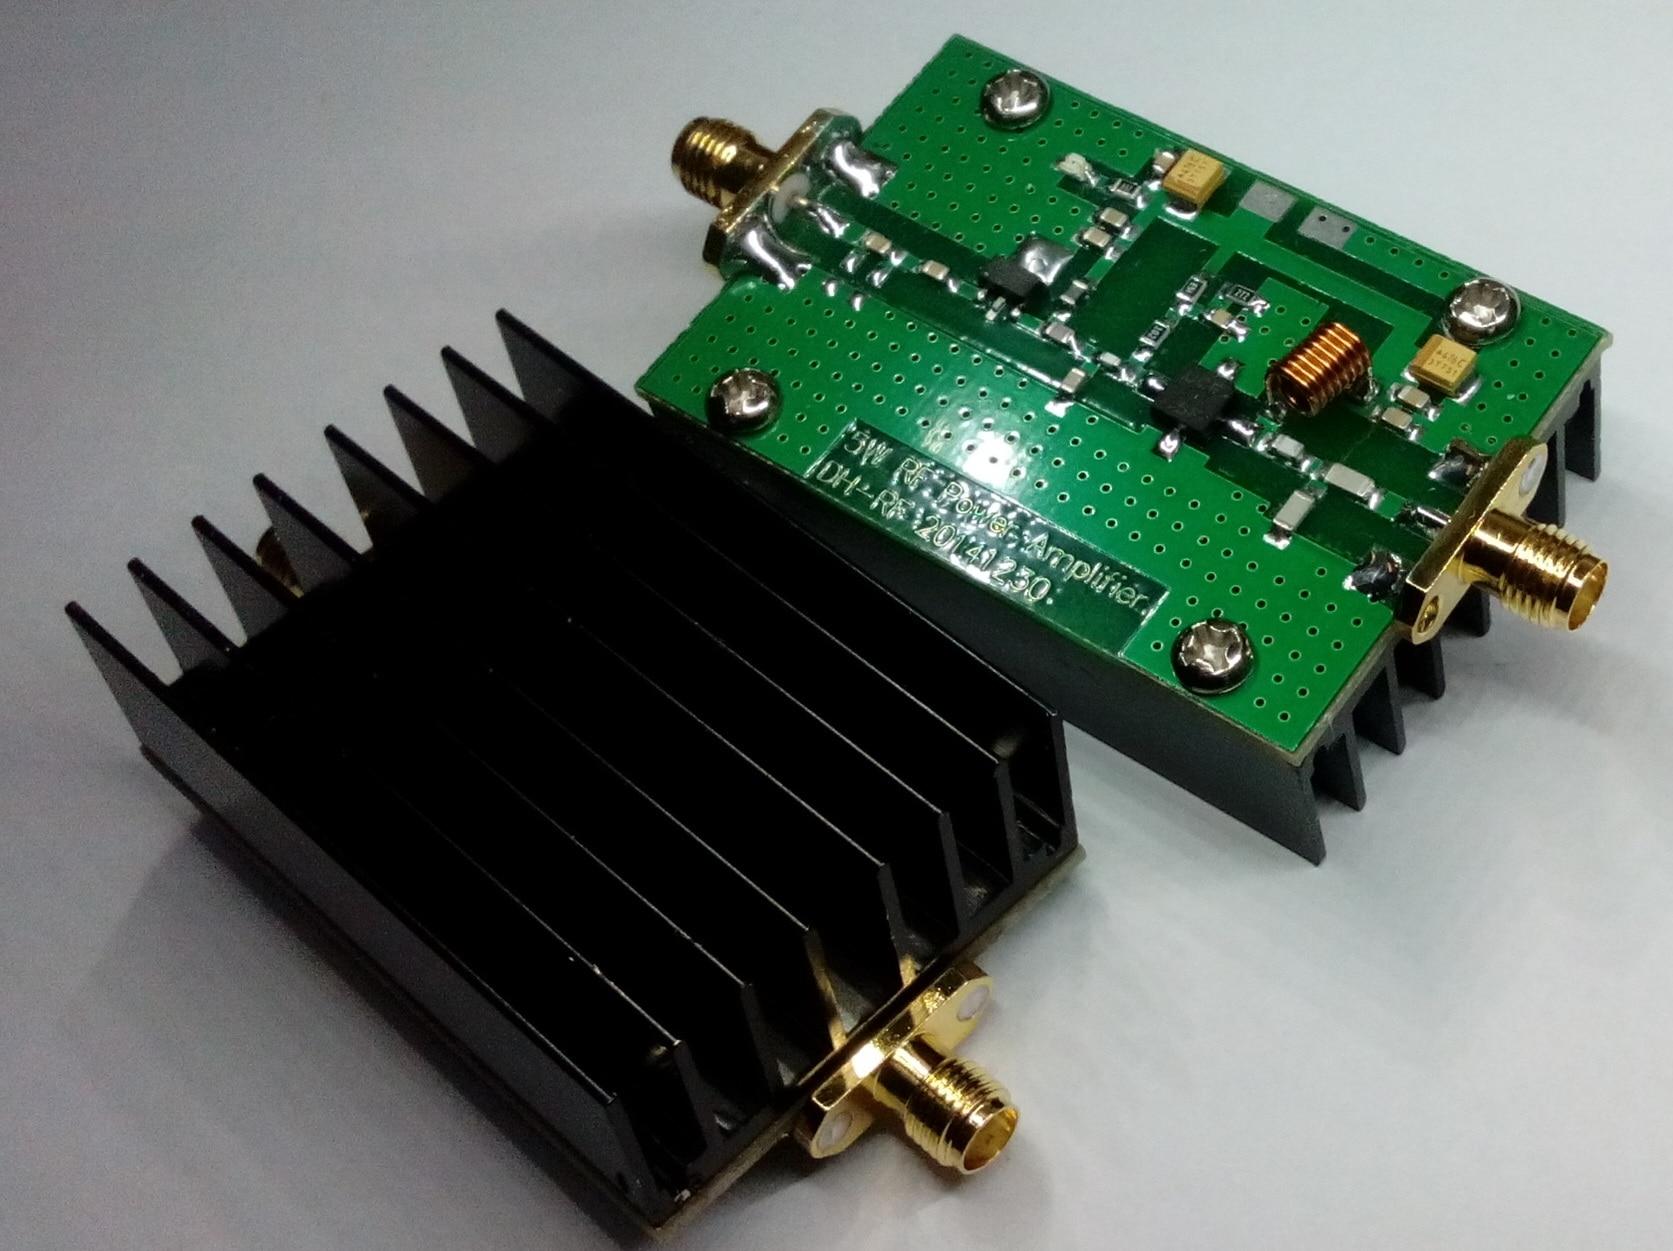 315MHz 5 Watt remote controller power amplifier remote controller315MHz 5 Watt remote controller power amplifier remote controller